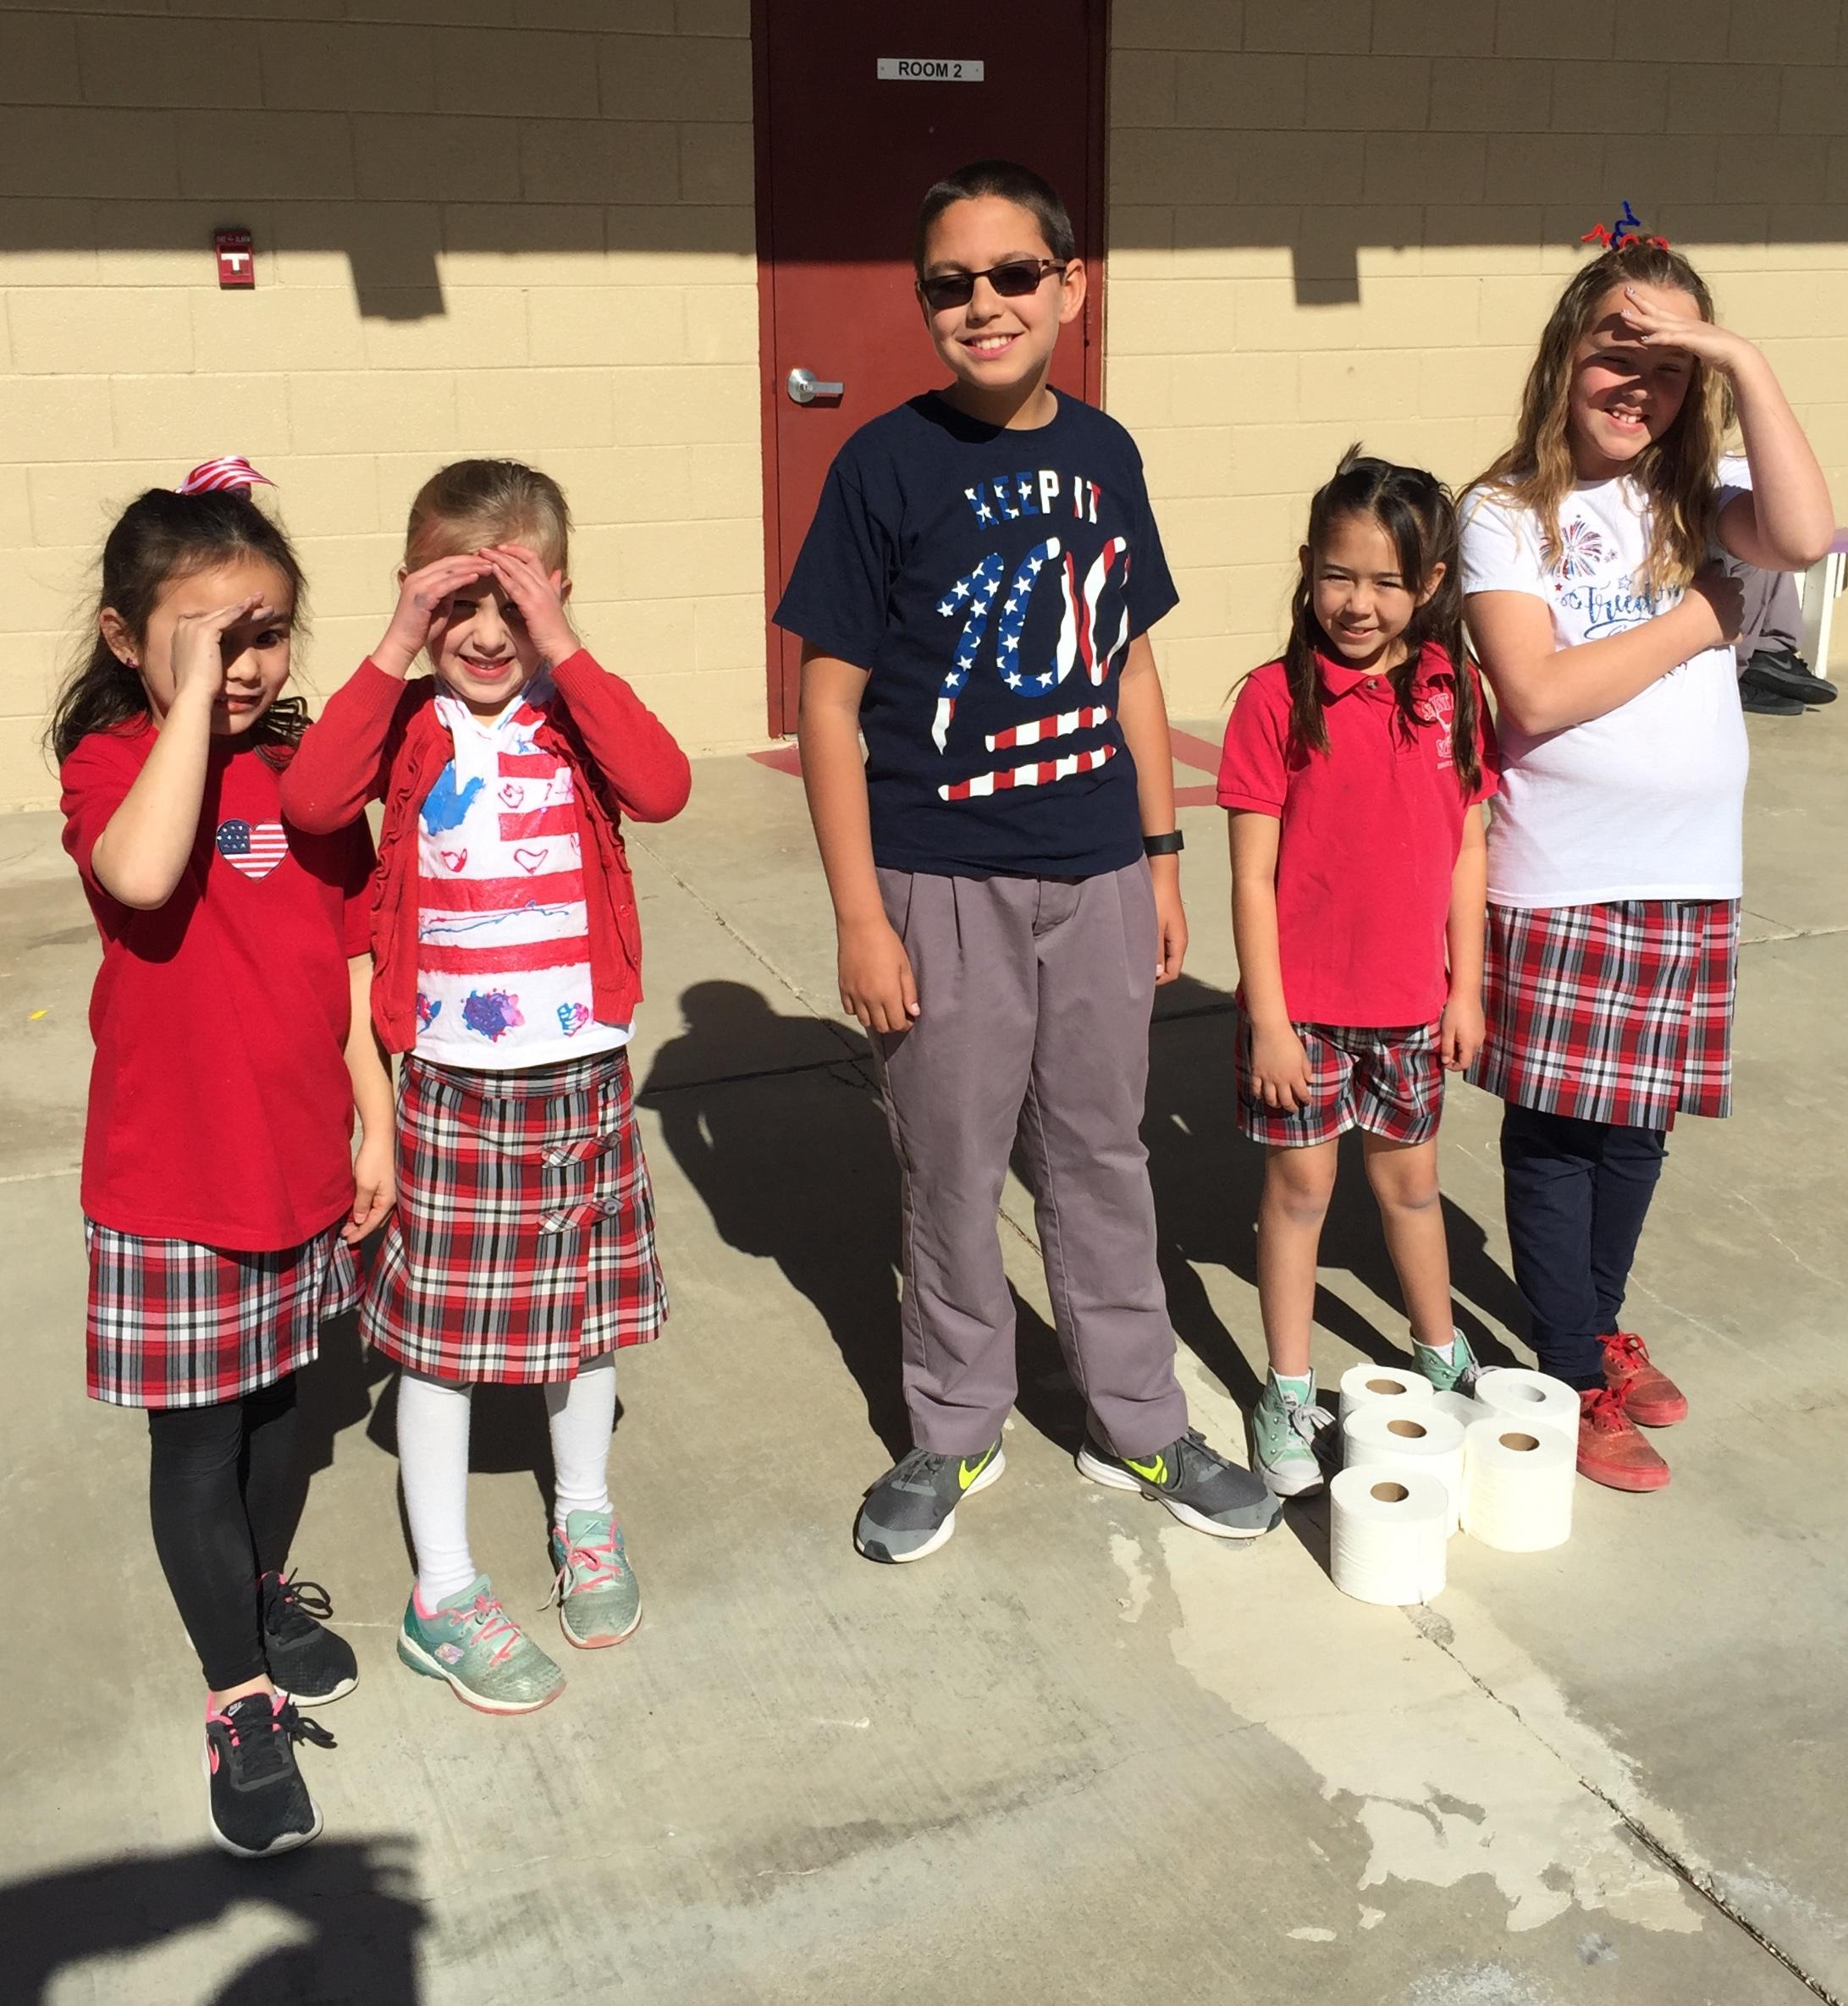 Wed-Mummy&Patriotic-Brandon&Team